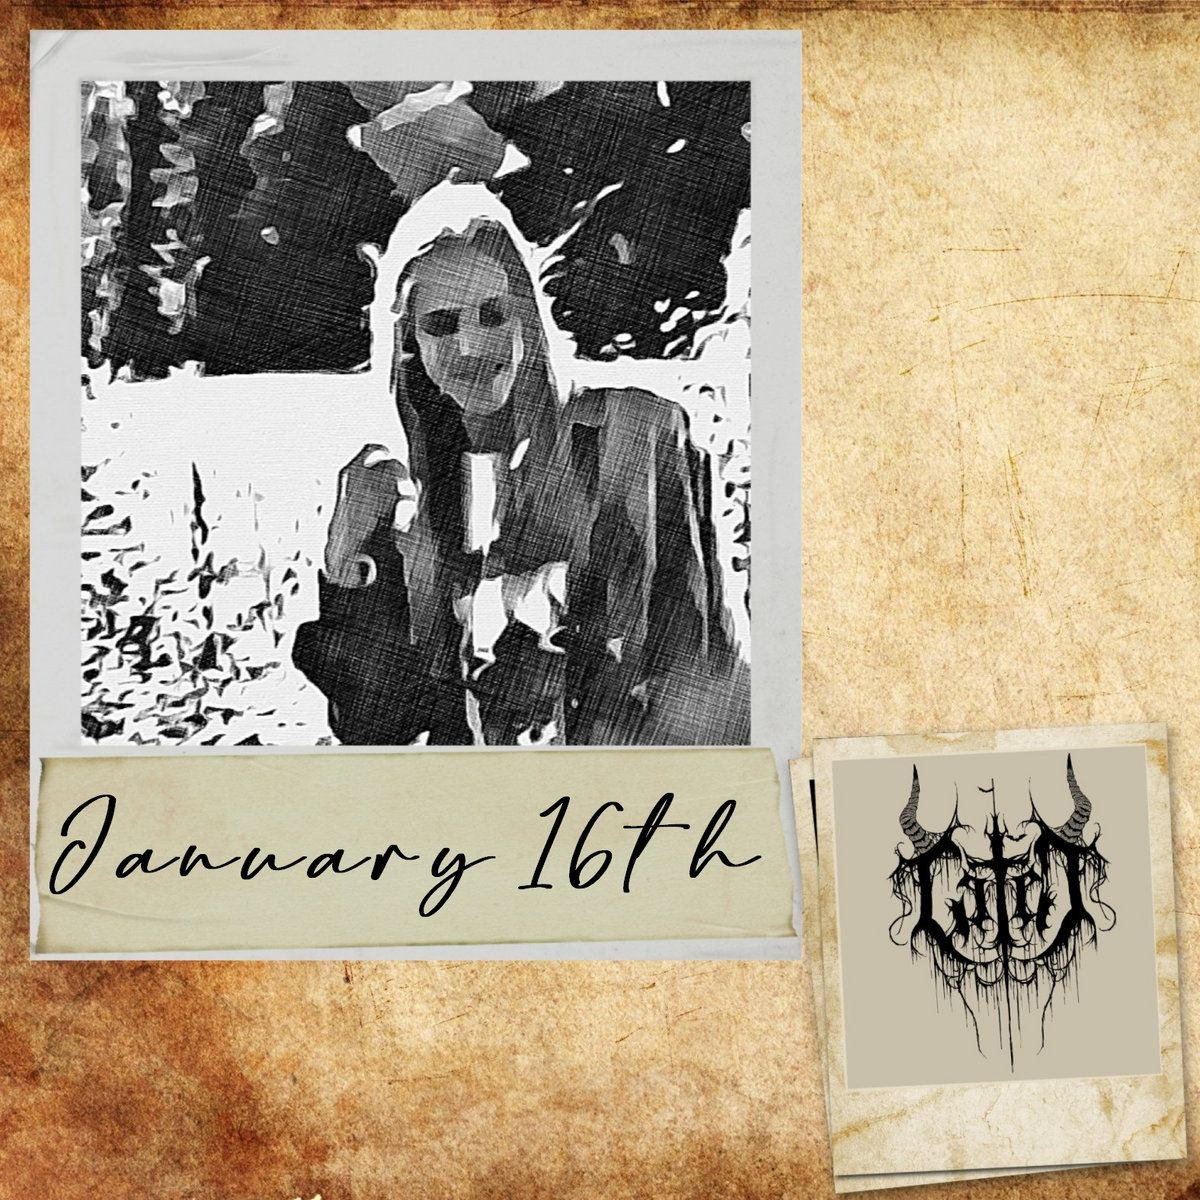 Geten - January 16th